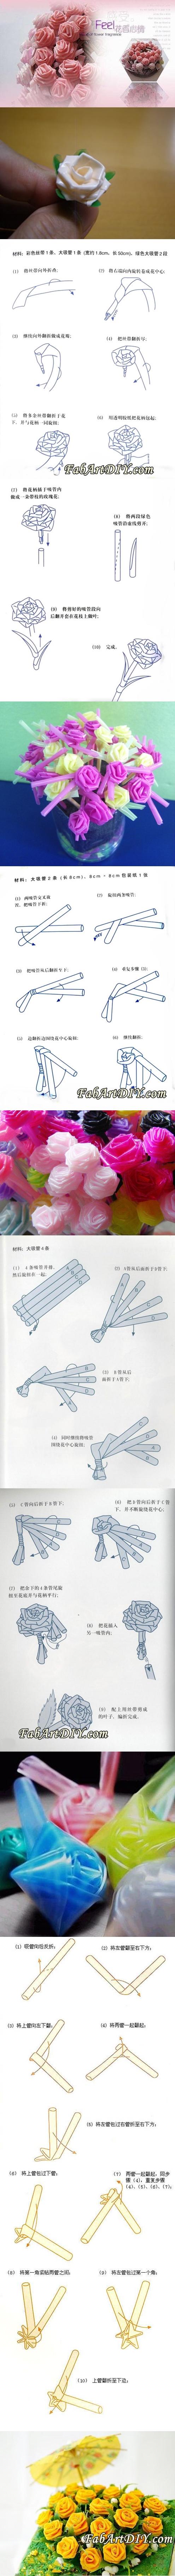 4 straw roses illustrations